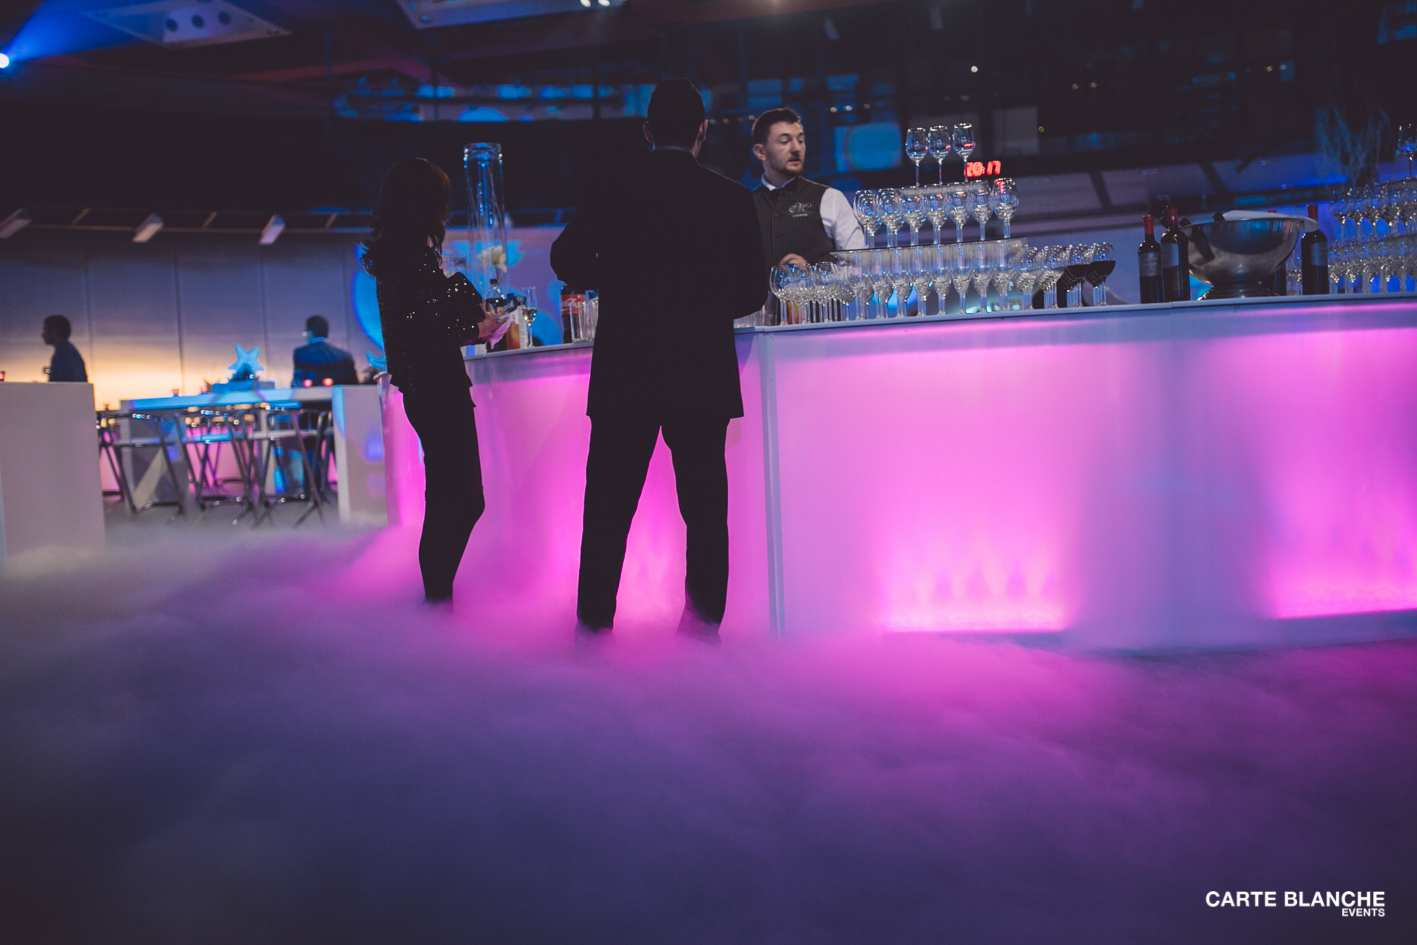 xmas-party-ferrero-2013-partage-rencontre-projet-luxembourg